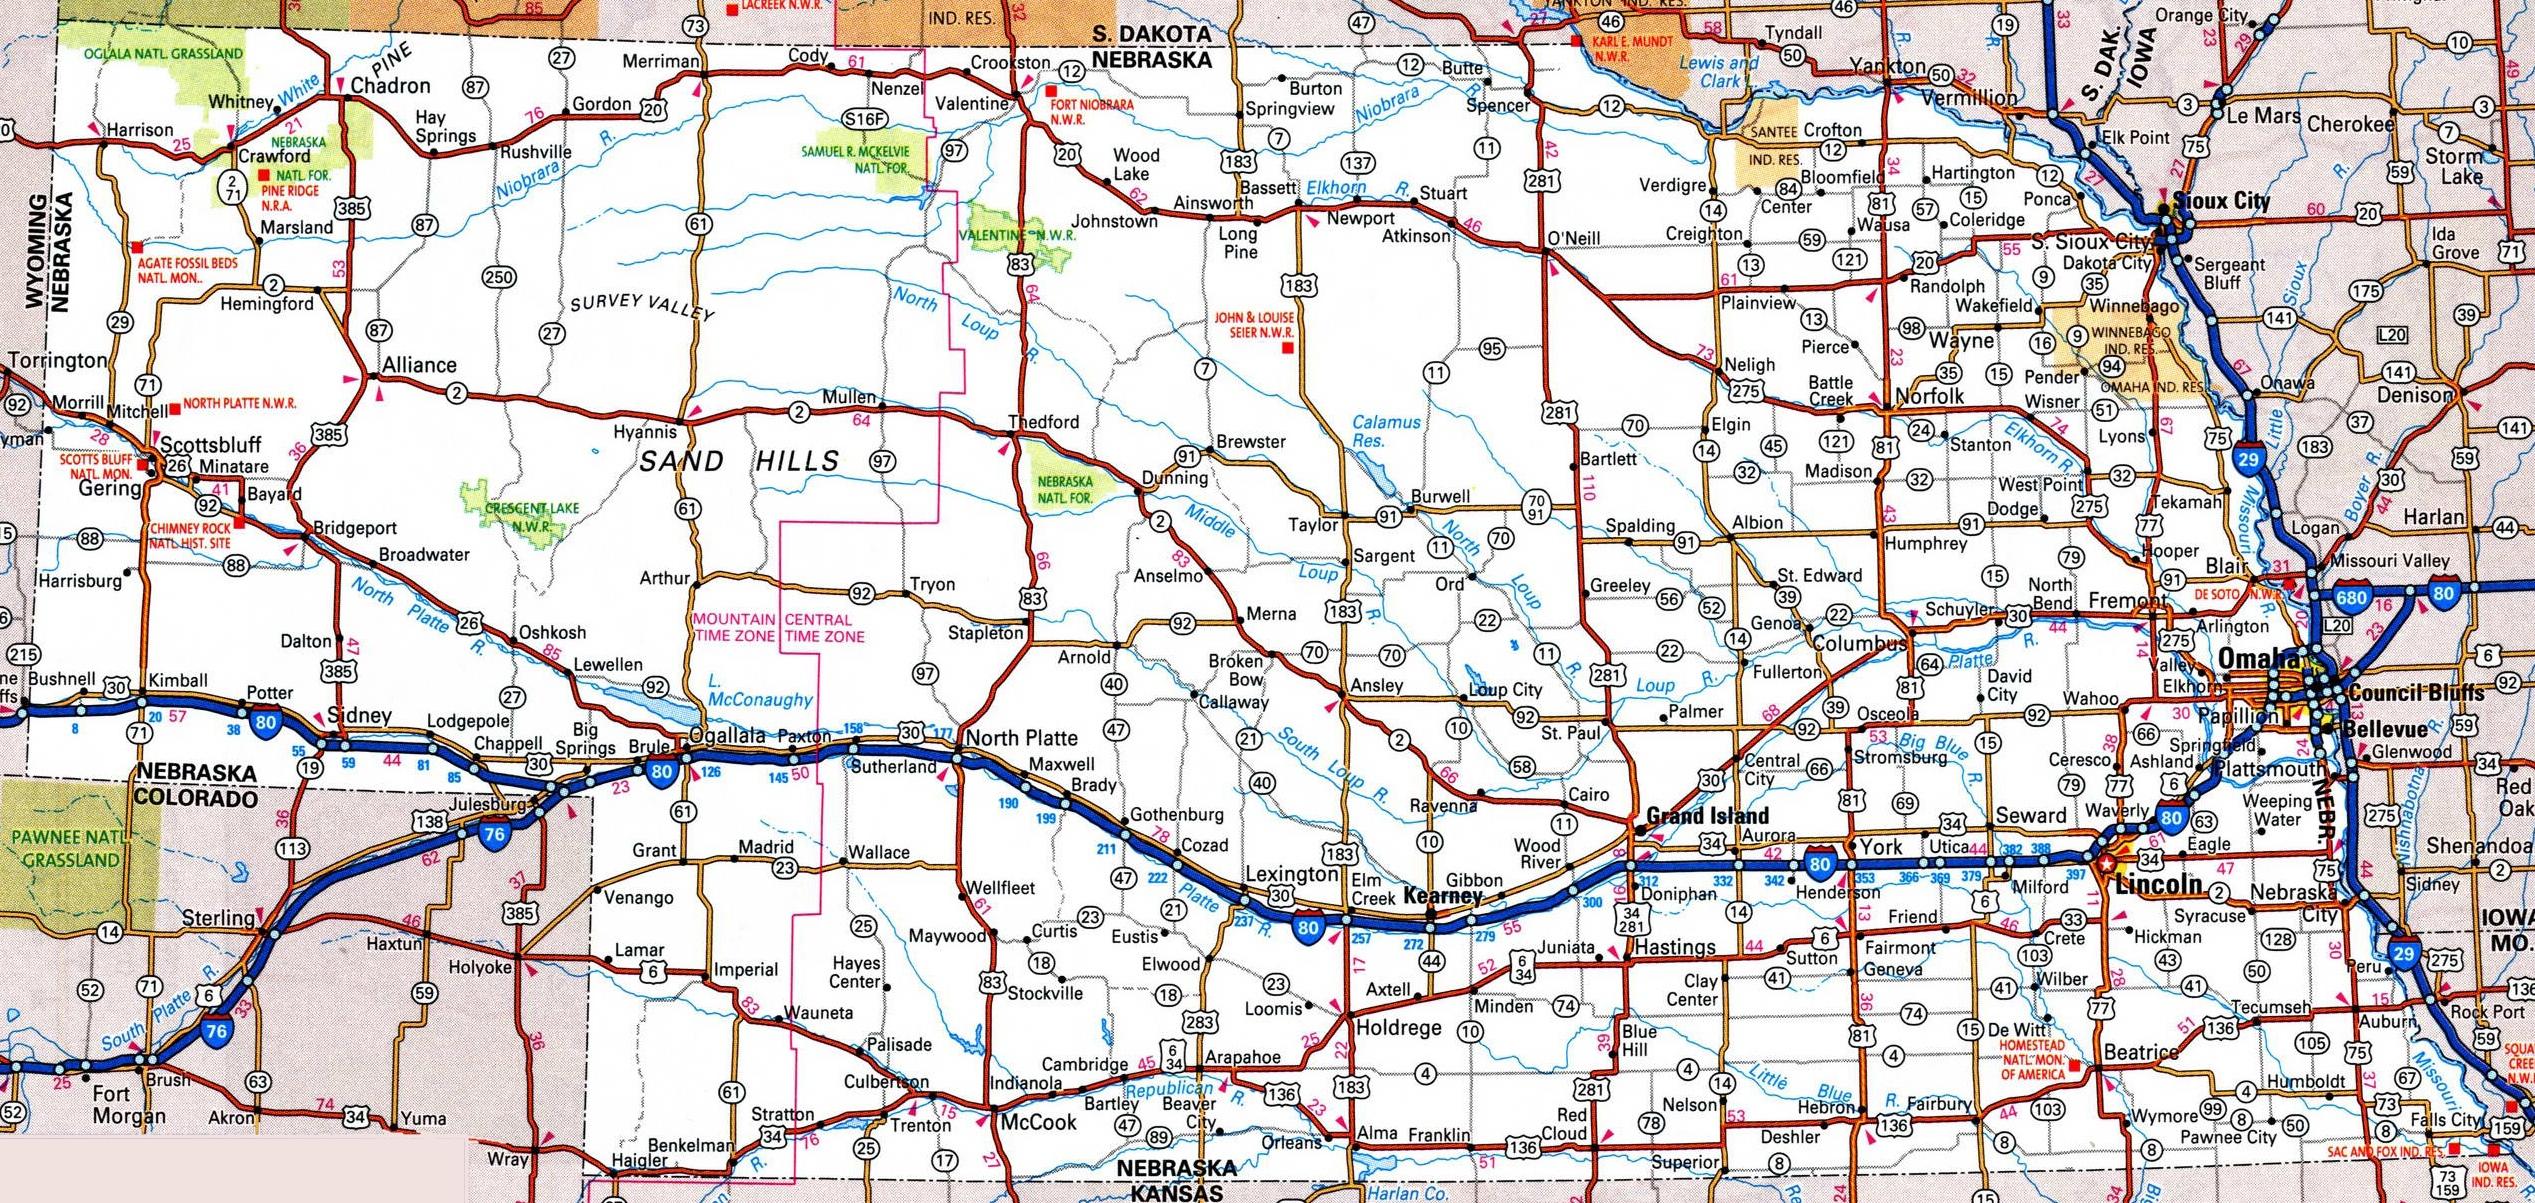 Nebraska Road Map - Free Printable Driving Maps